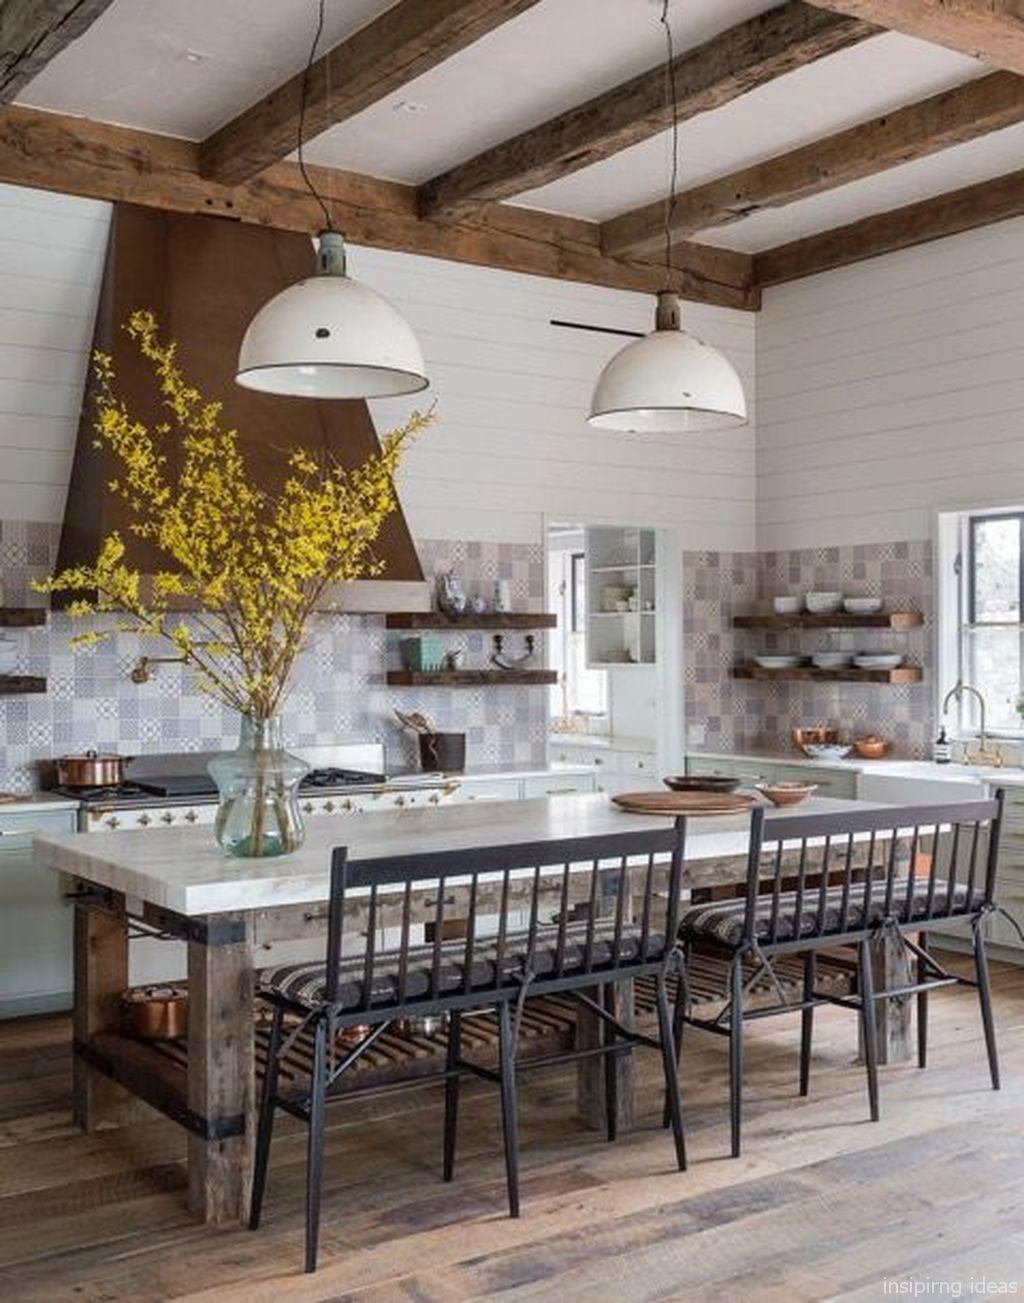 Pin by yvonne howland on kitchen in pinterest kitchen